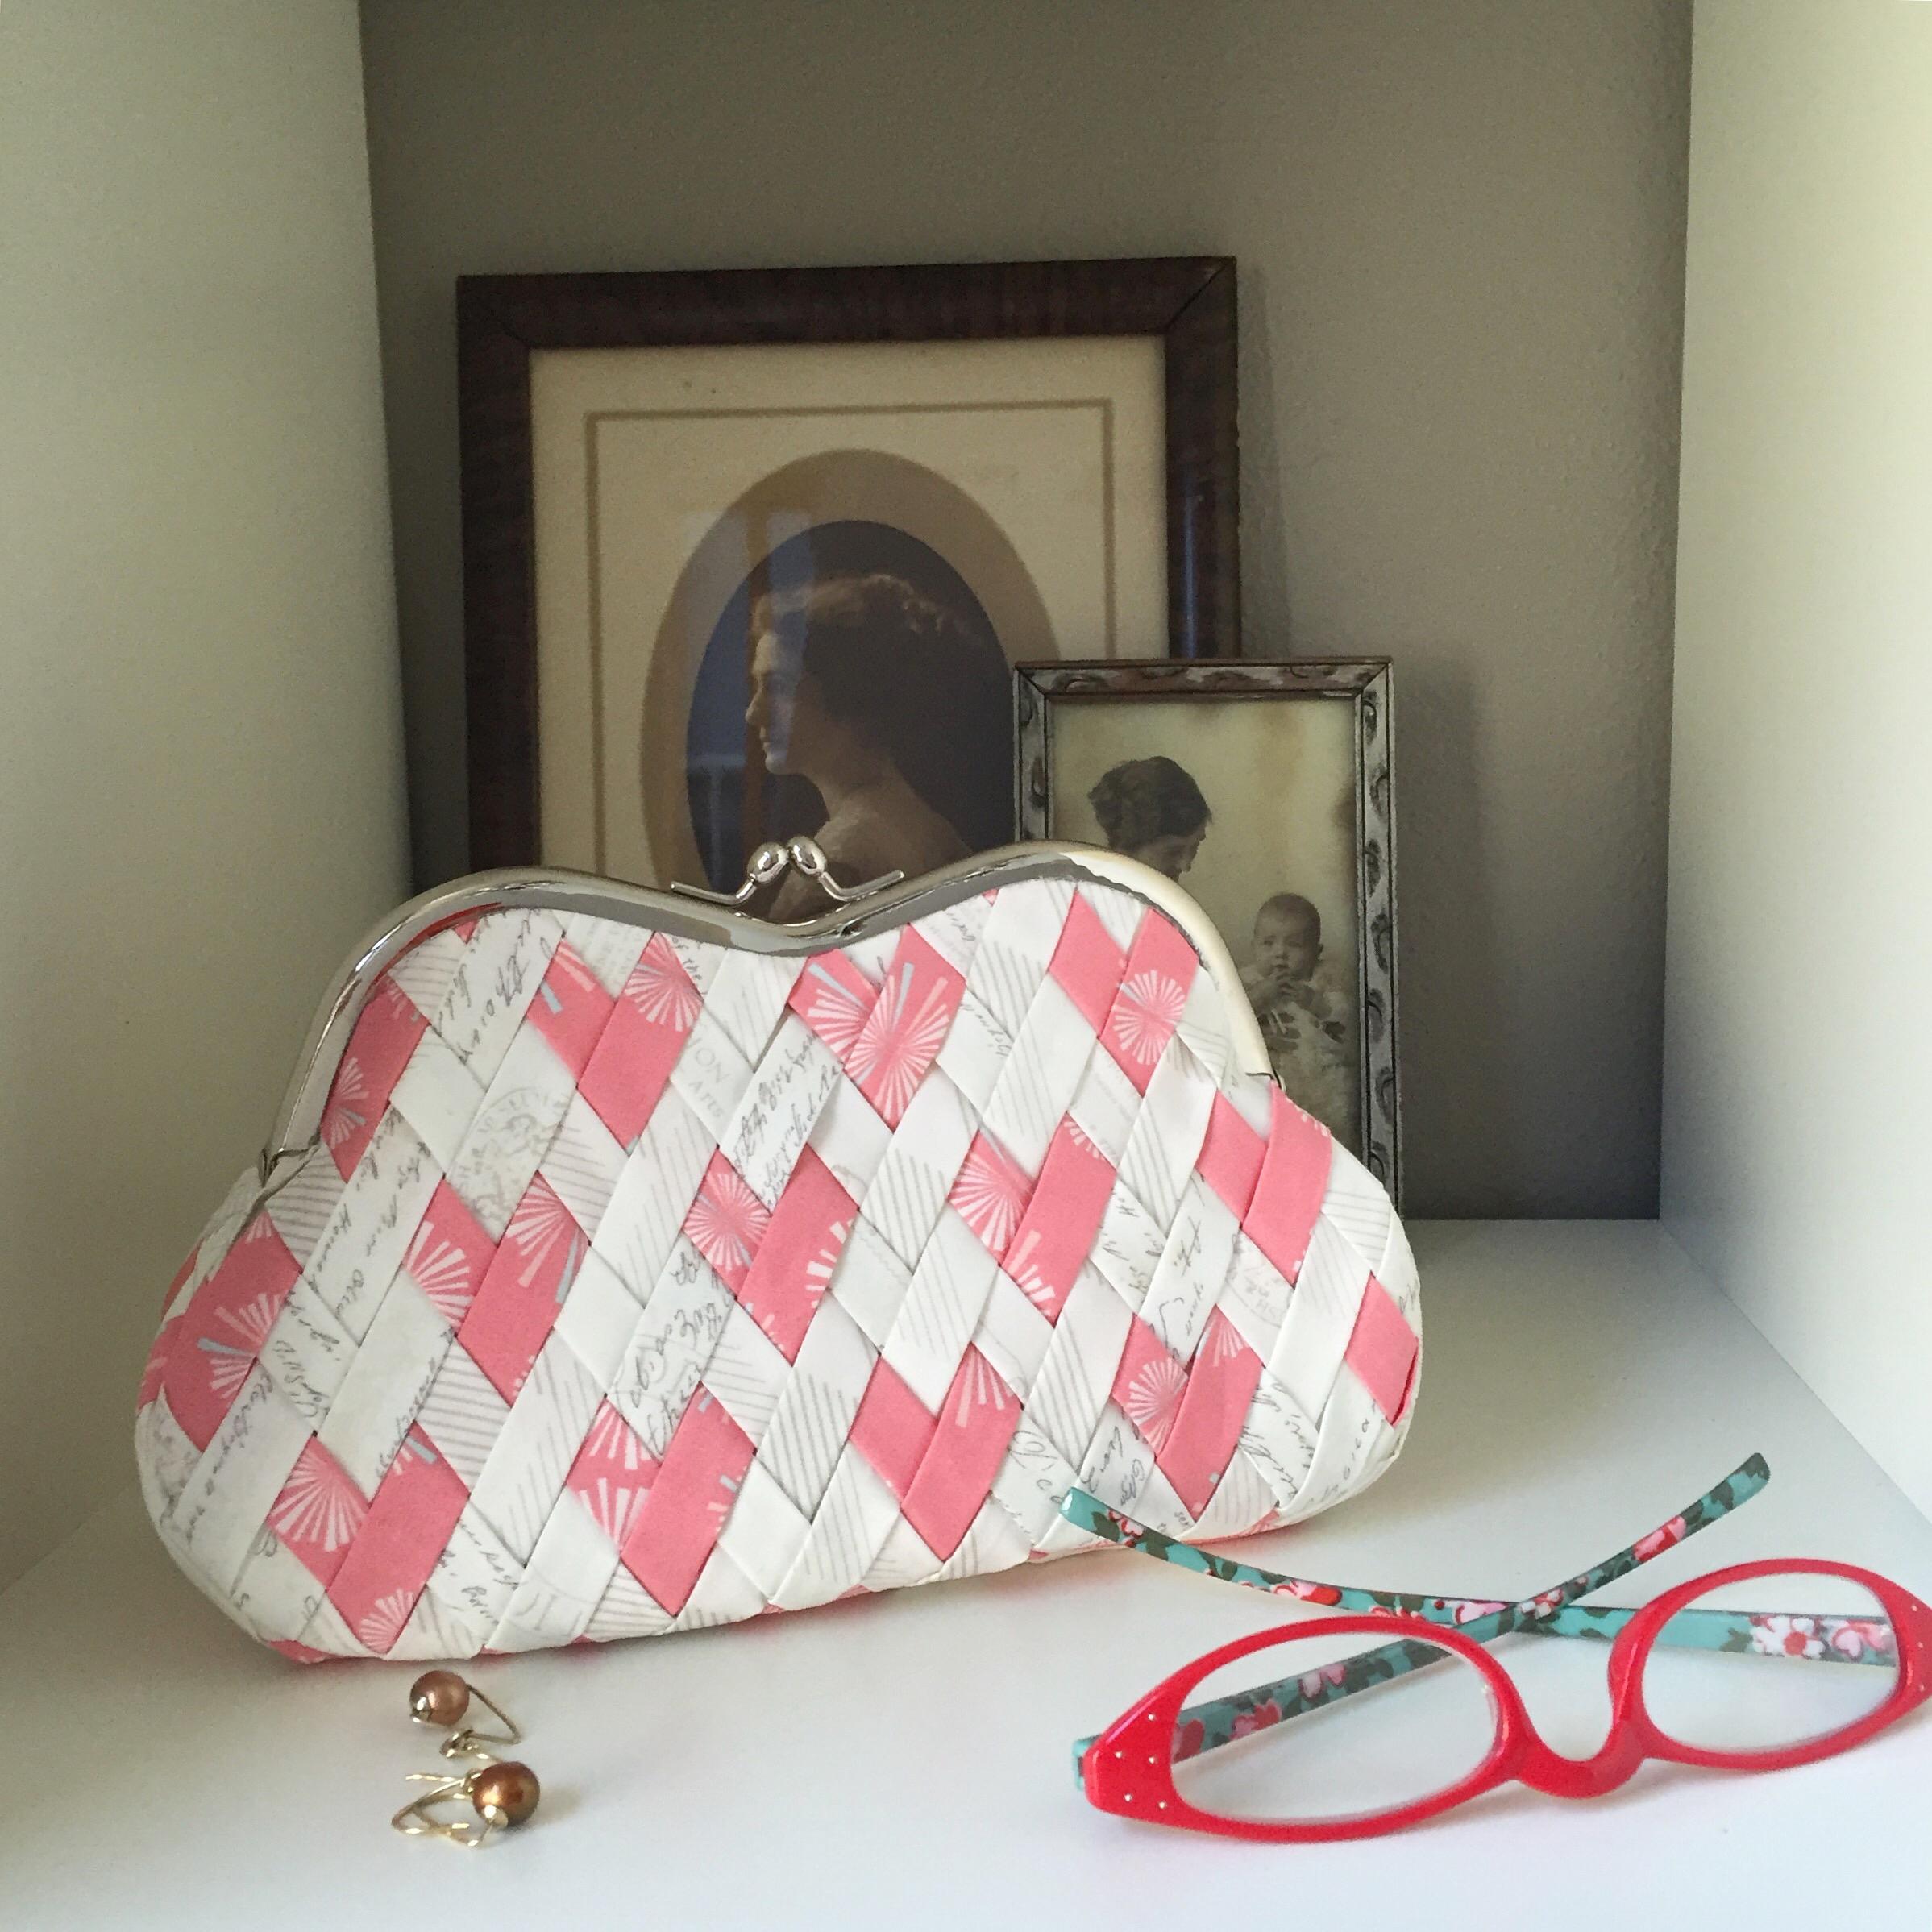 Curvy Clutch (Hearts Weave) in Amy Sinibaldi Paperie